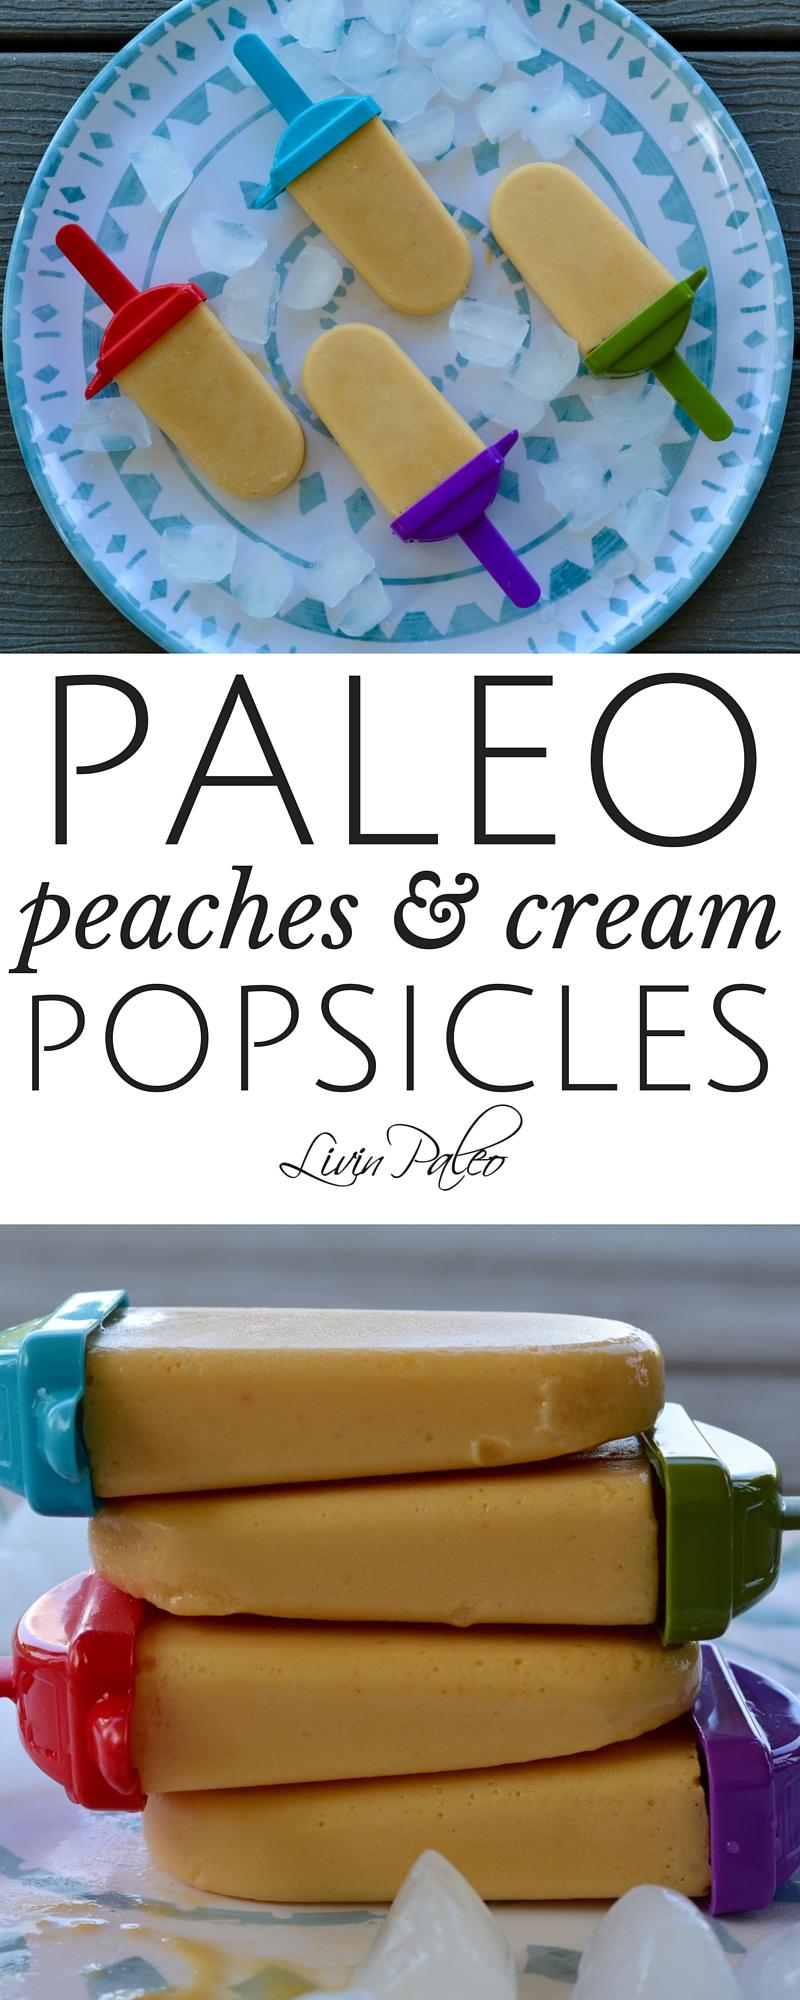 Paleo peaches and cream popsicles